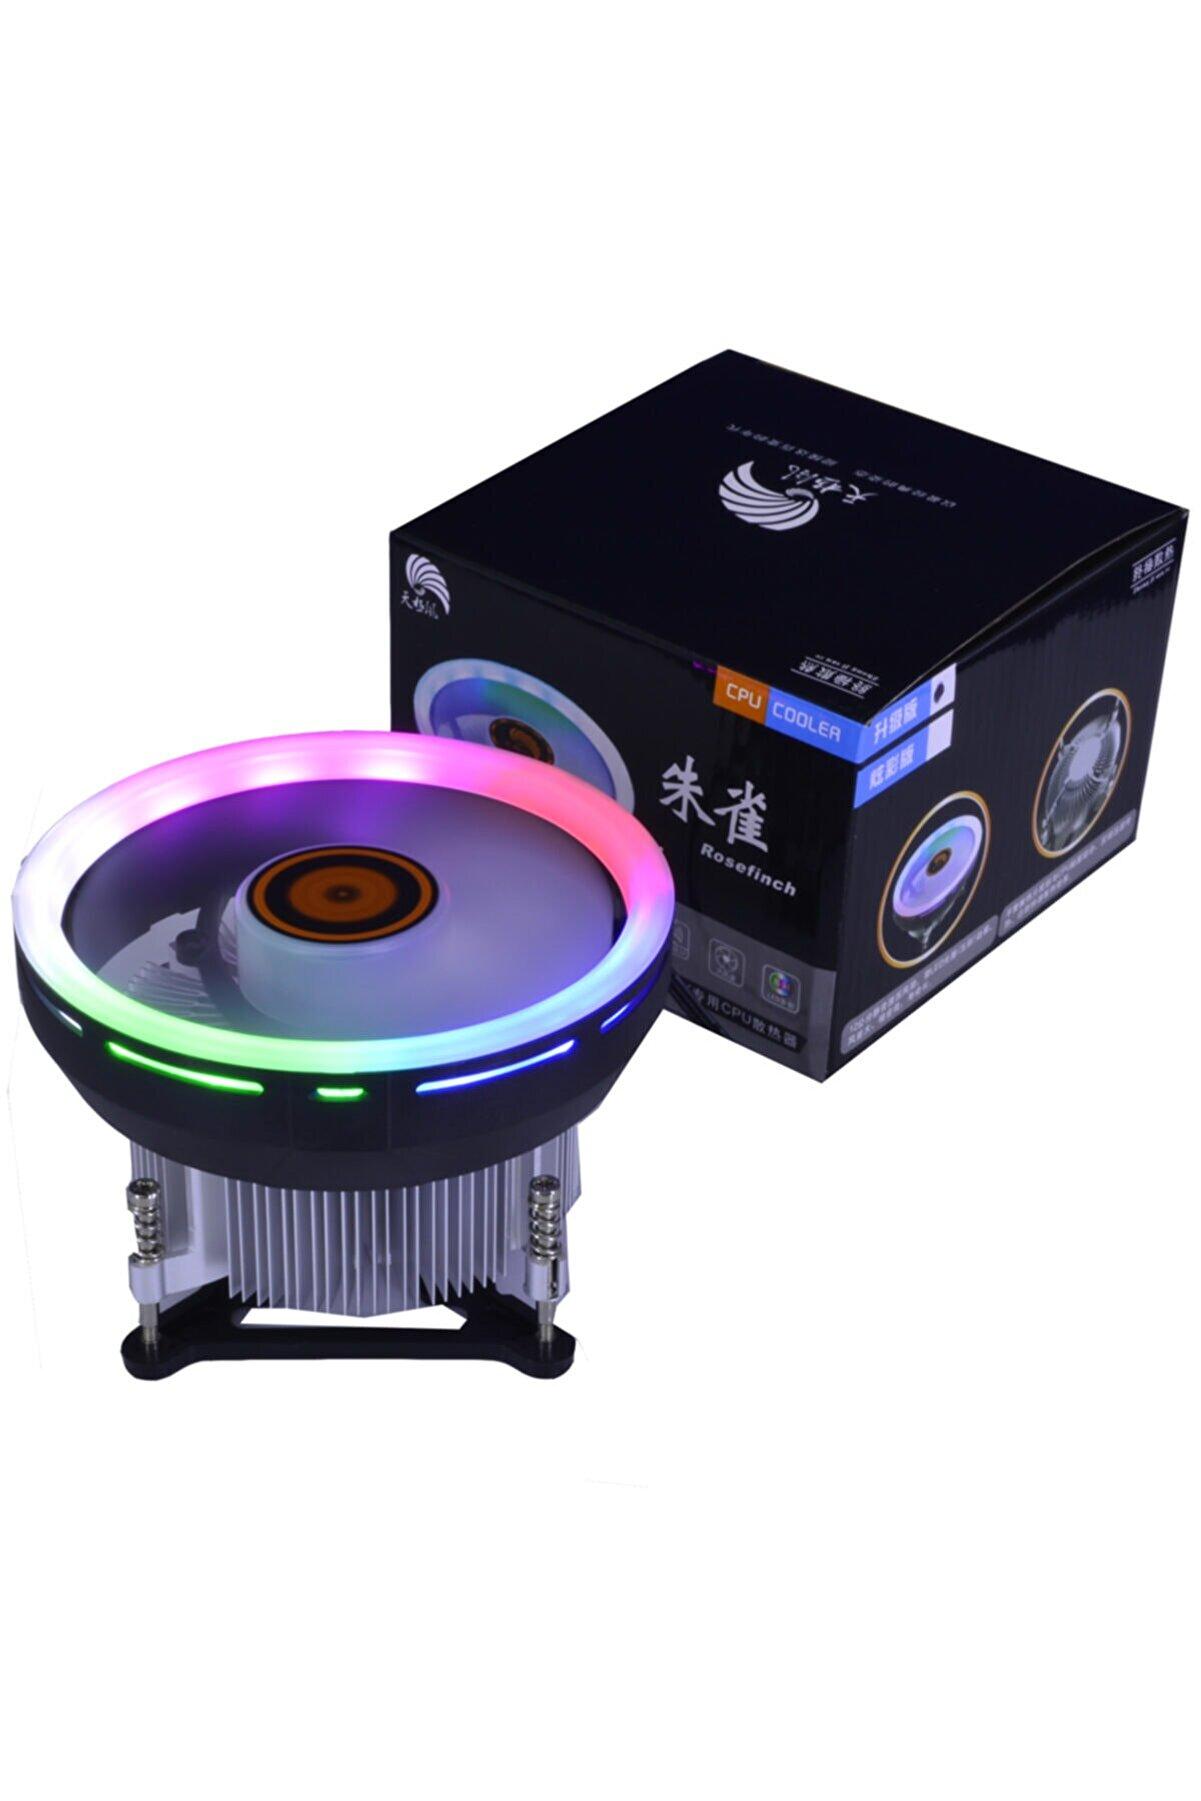 kervansanal Asura Intel I3/i5/i7 1150/1151/1155/1156 Uyumlu Rgb Işıklı Fan